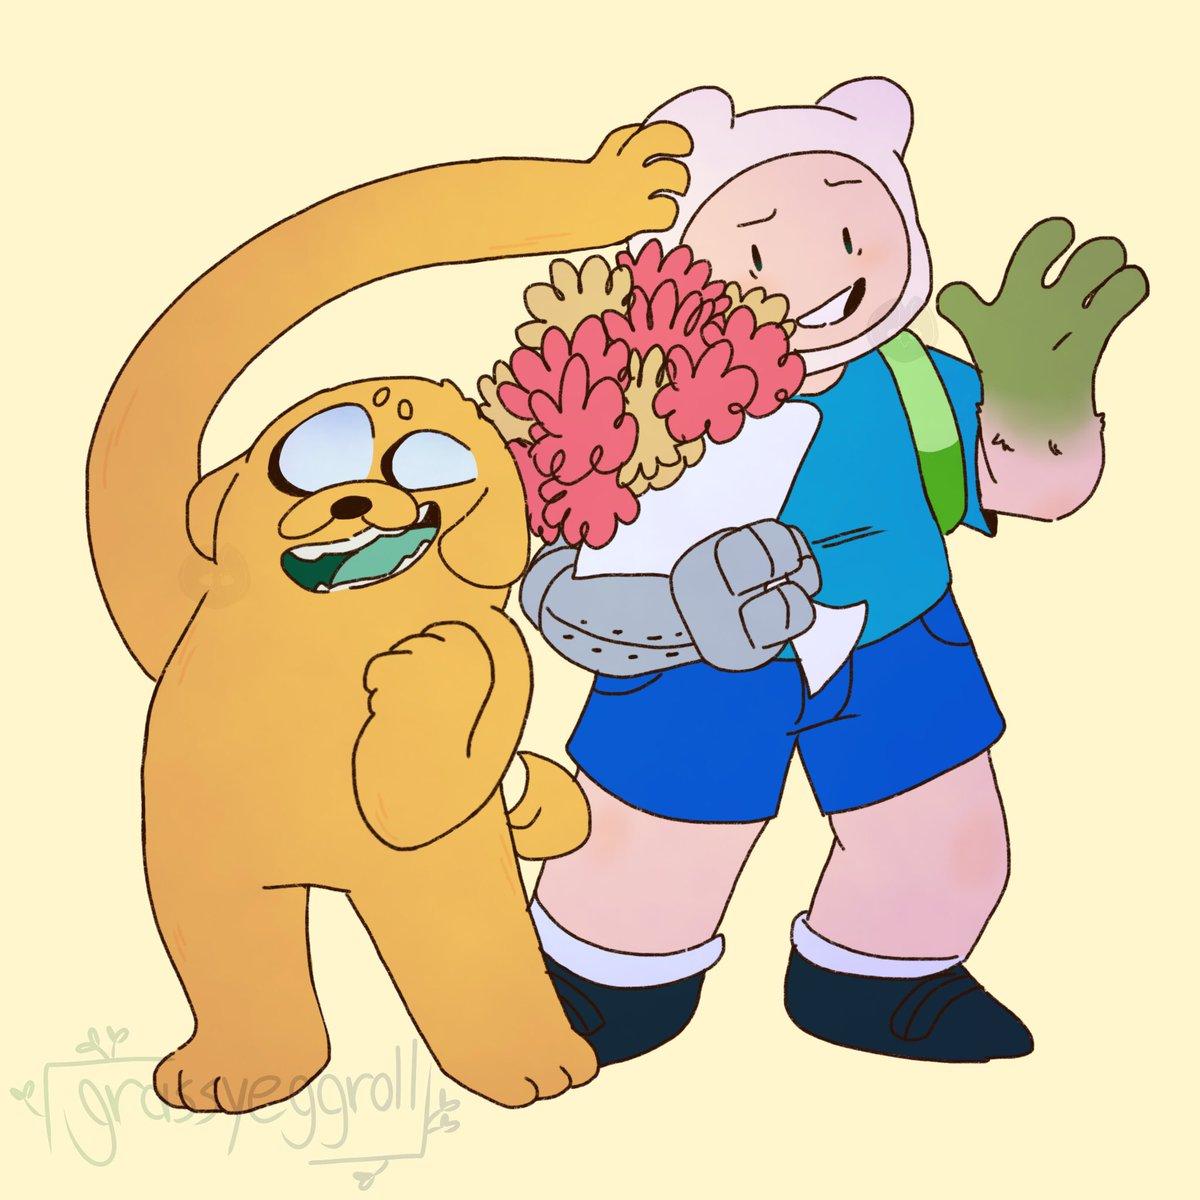 Finn(?) And Jake(?) #adventuretime #fernthehuman #fernmertens #poppytheplantdog